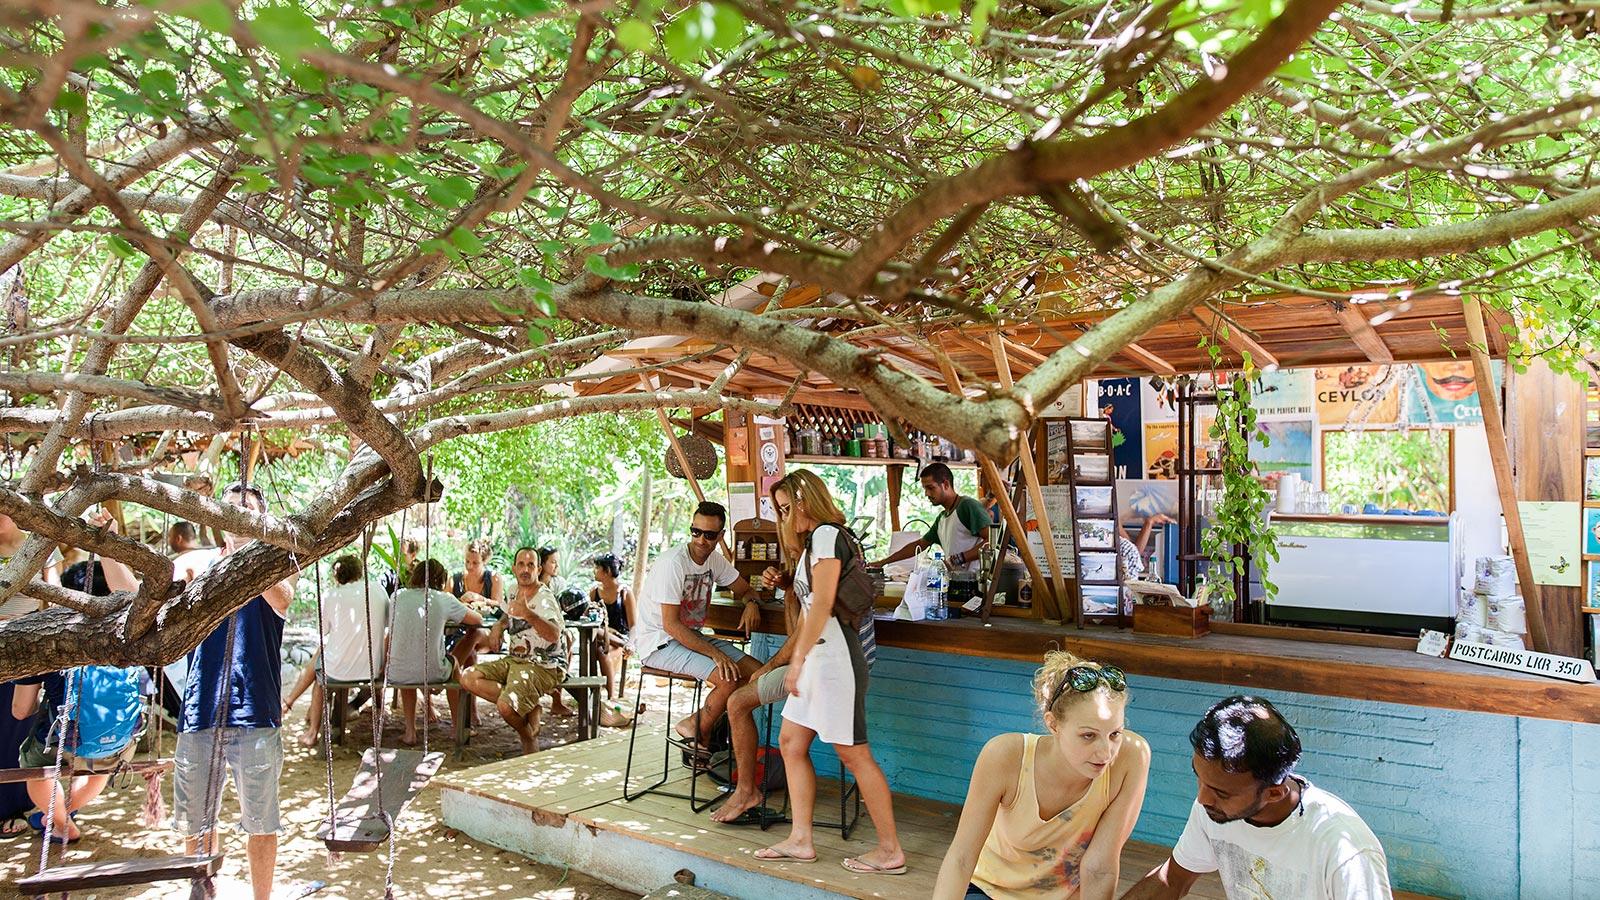 WHERE TO EAT IN ARUGAM BEACH